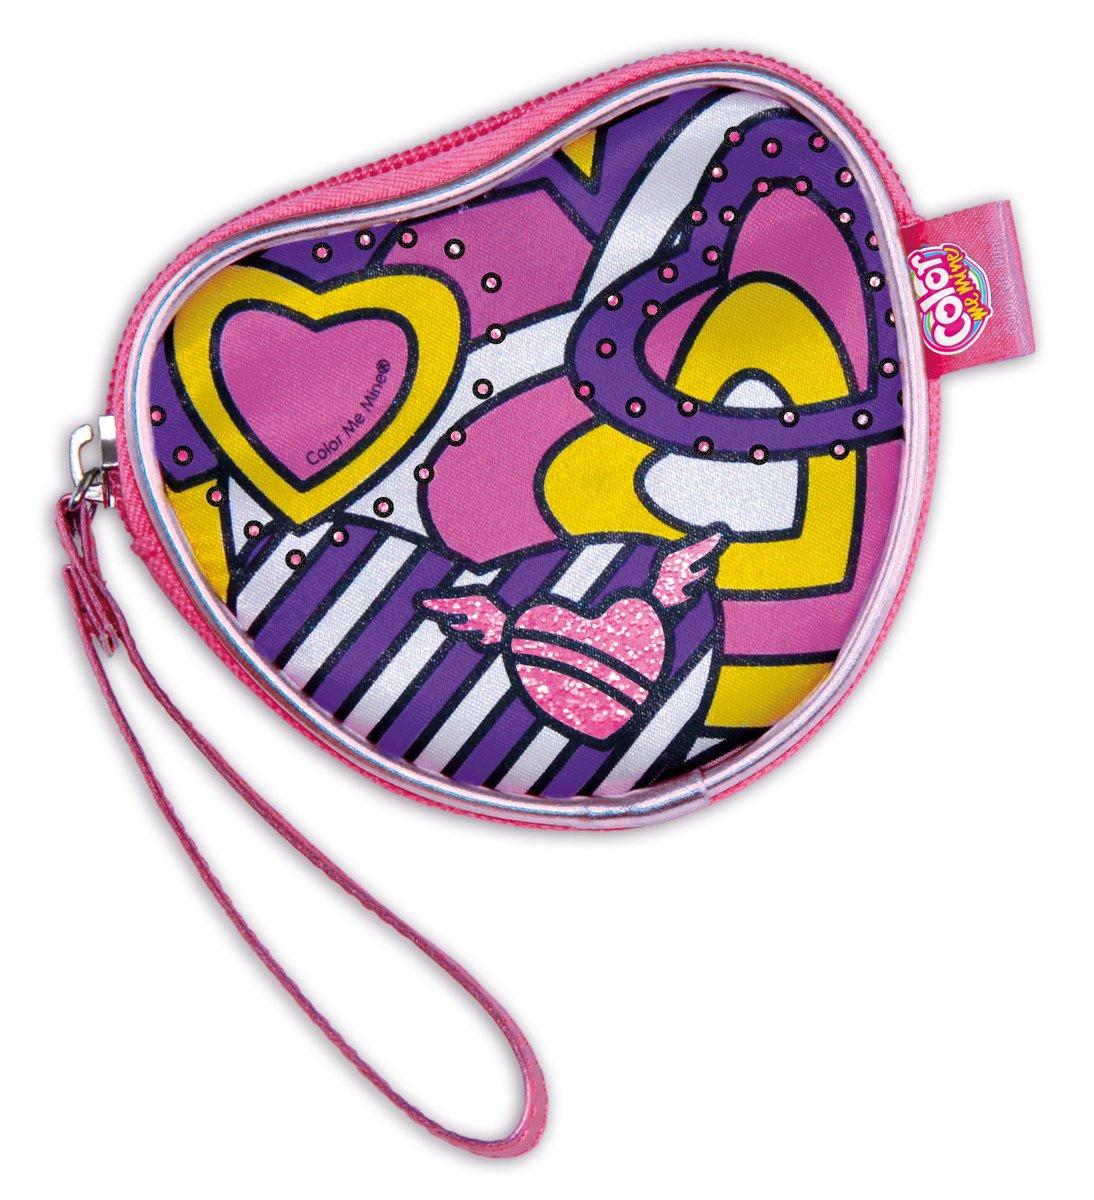 CMM Diamond Party Heart Purse   B00NHPV1I0